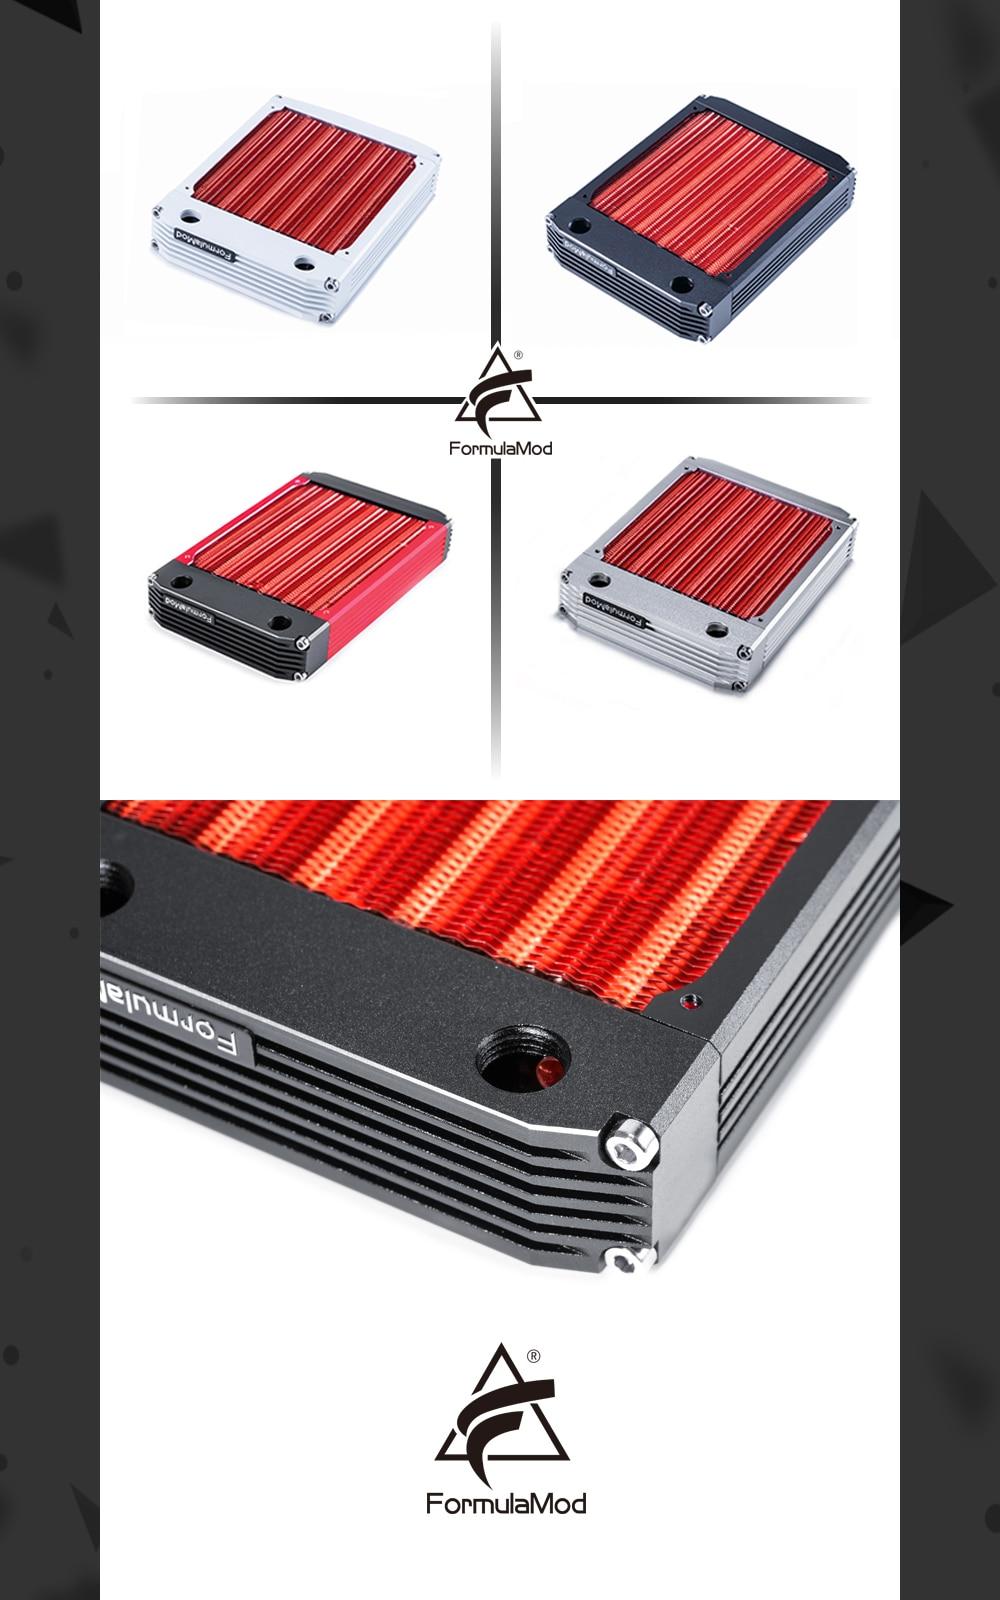 FormulaMod 360mm Radiator Copper 120/240/360mm 30mm Thickness 120mm Fan Water Cooling Radiator PC Radiator for Cooling